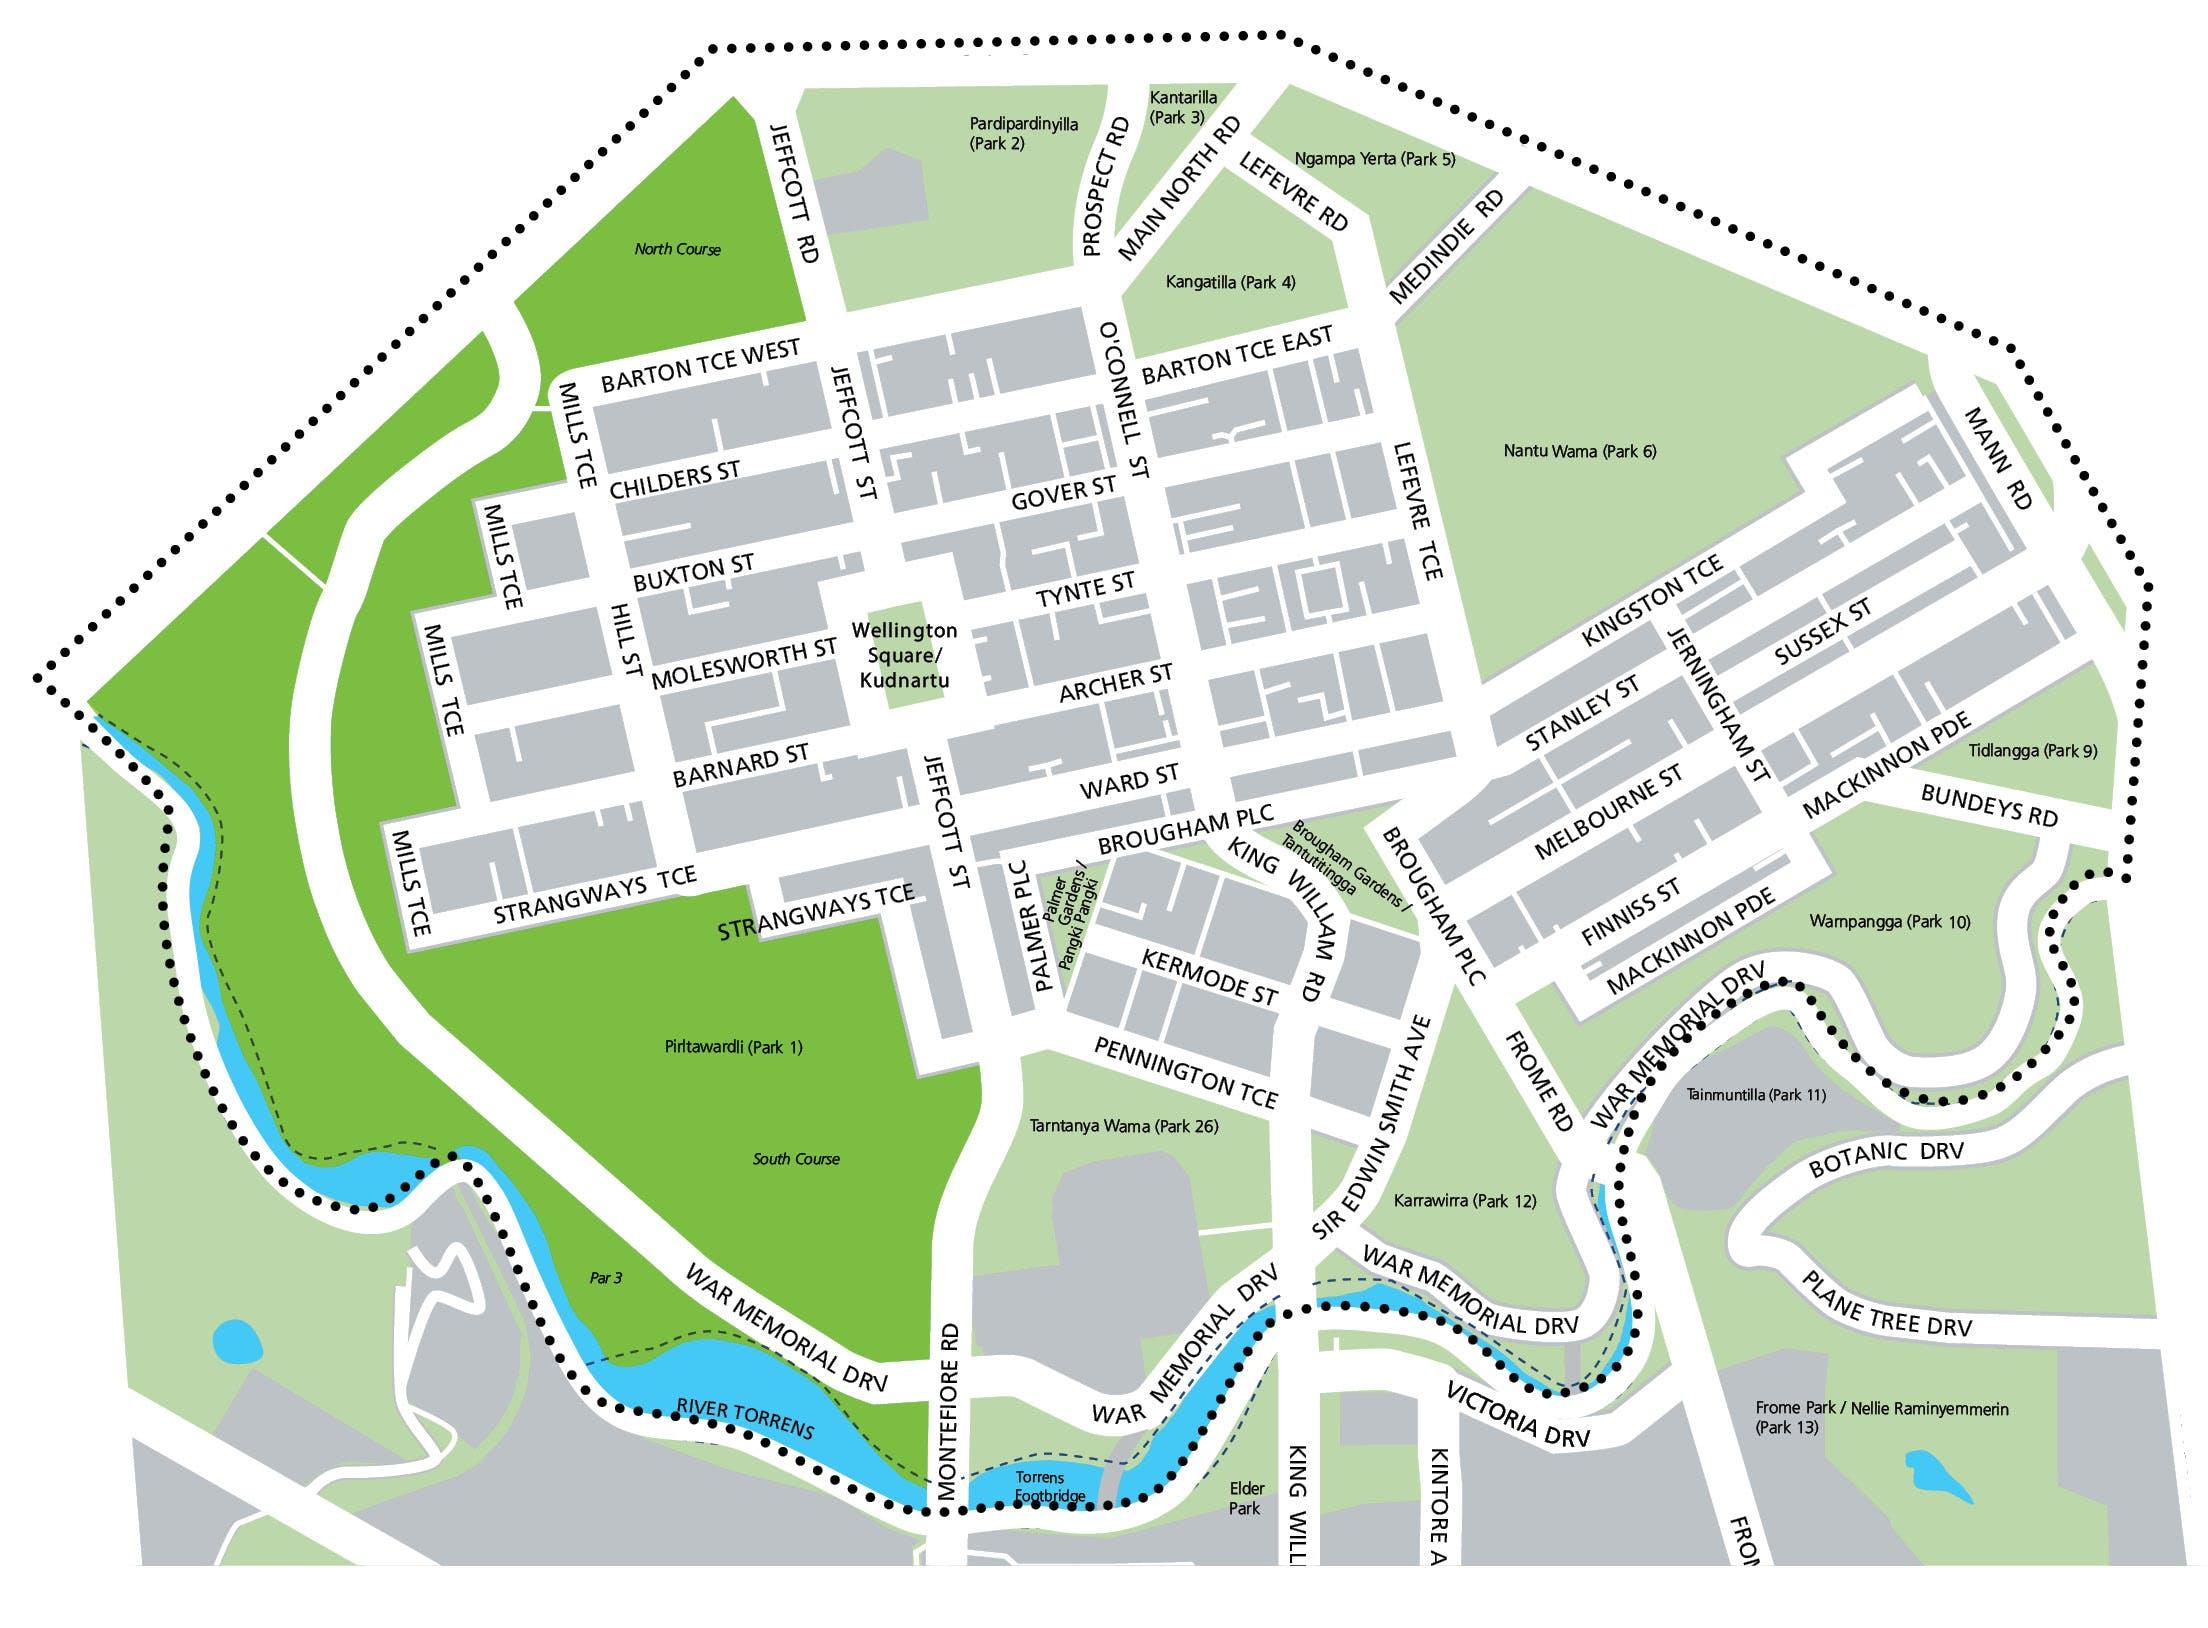 Pirltawardli /Park 1 Map